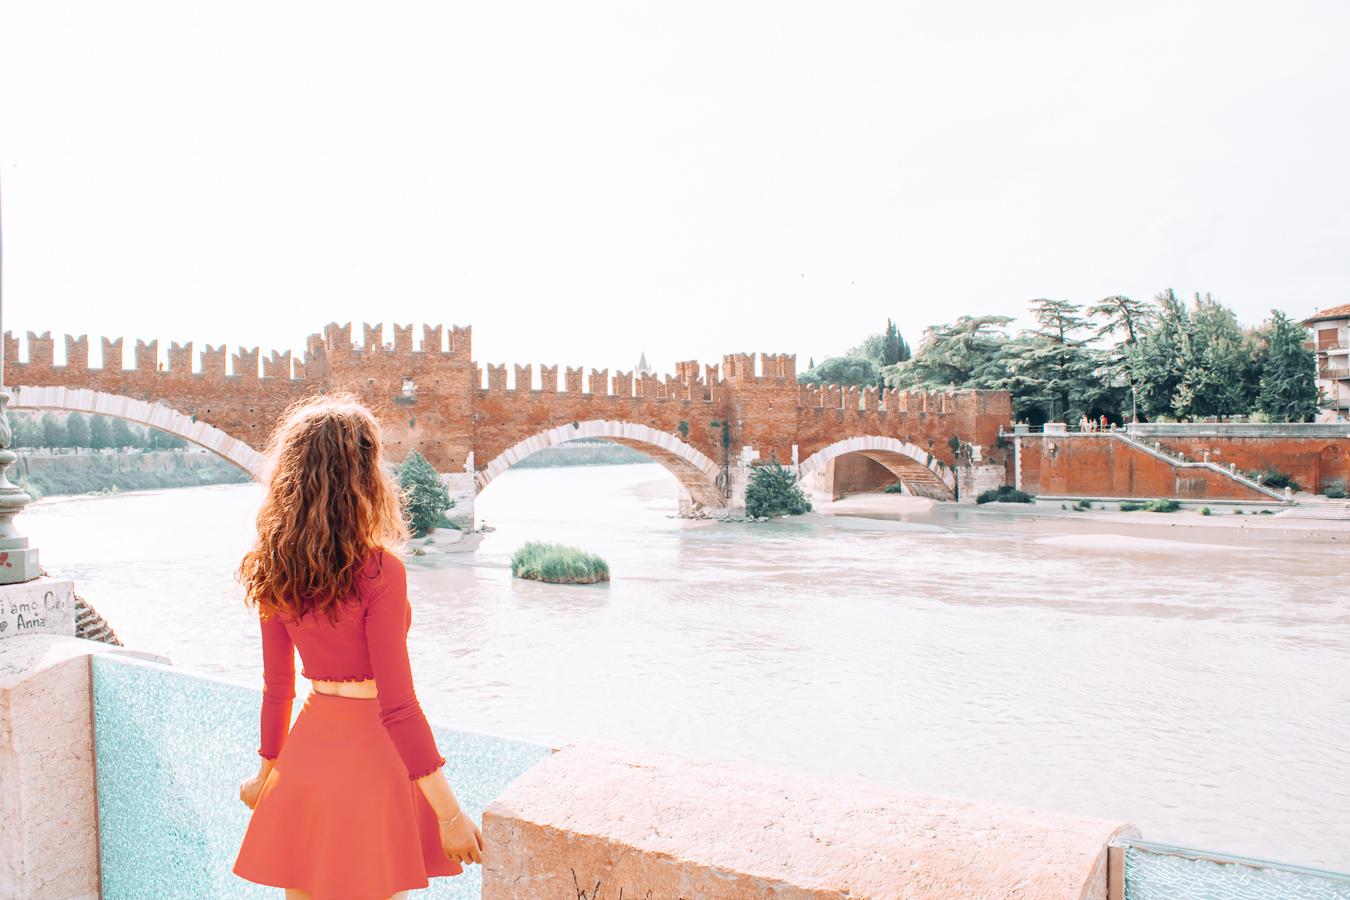 Girl looking at the Castelvecchio Bridge